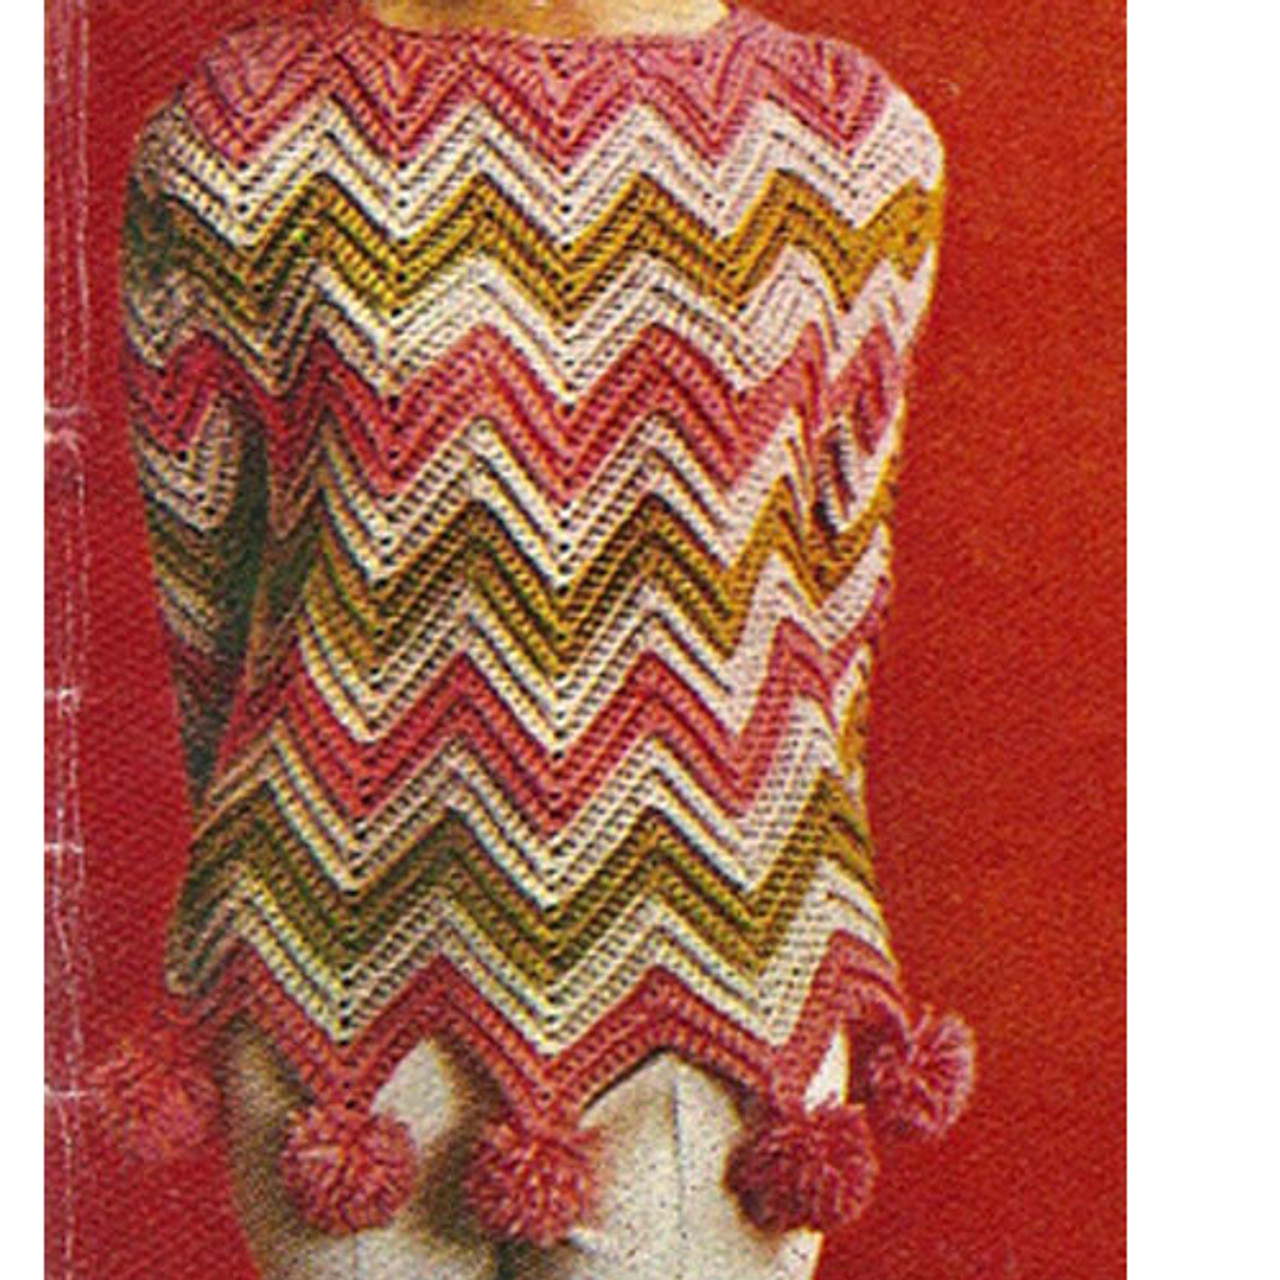 Tri-Color Ripple Sweater Pattern